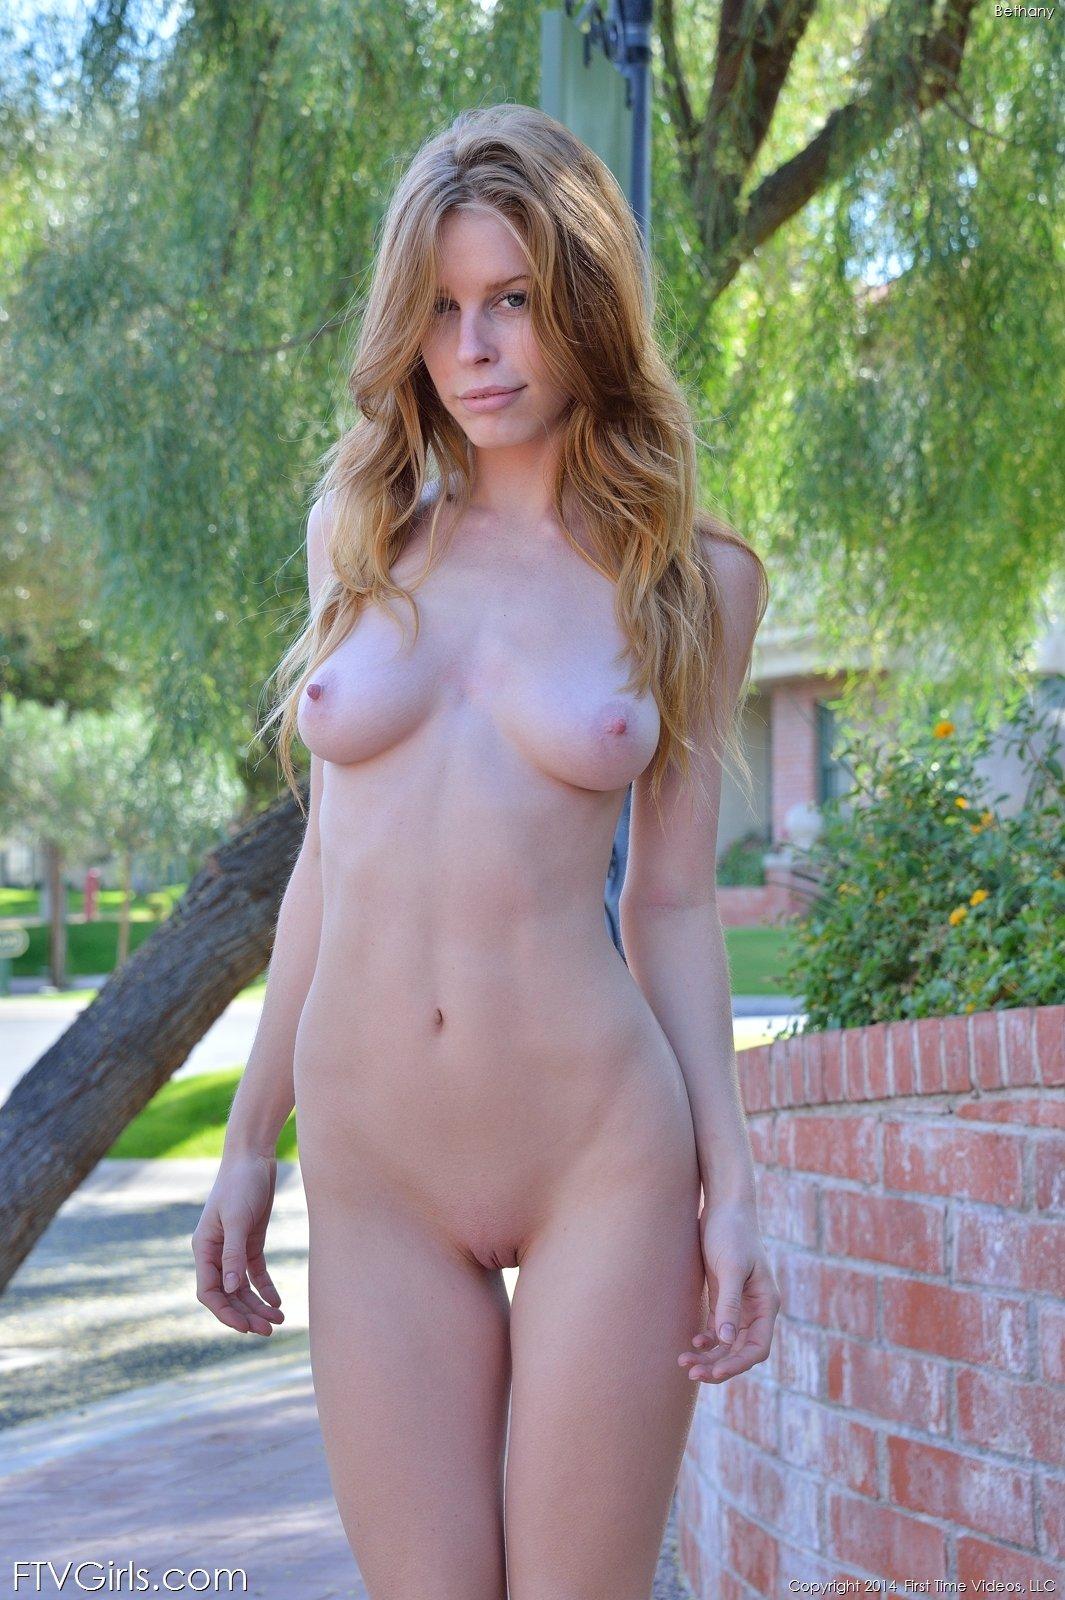 Pornstars naked in public